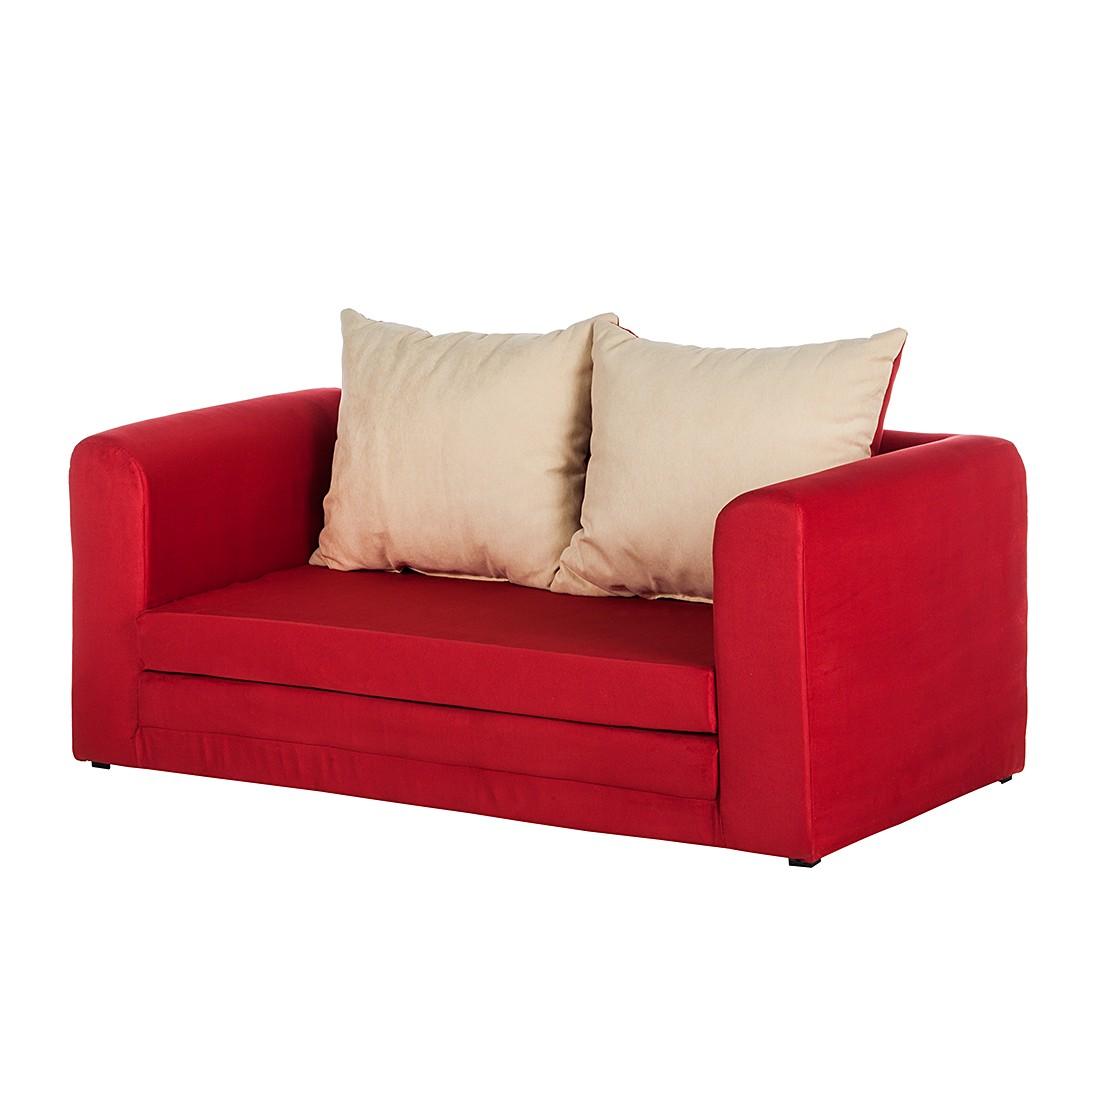 Schlafsofa Petty – Microfaser Rot, mooved jetzt kaufen